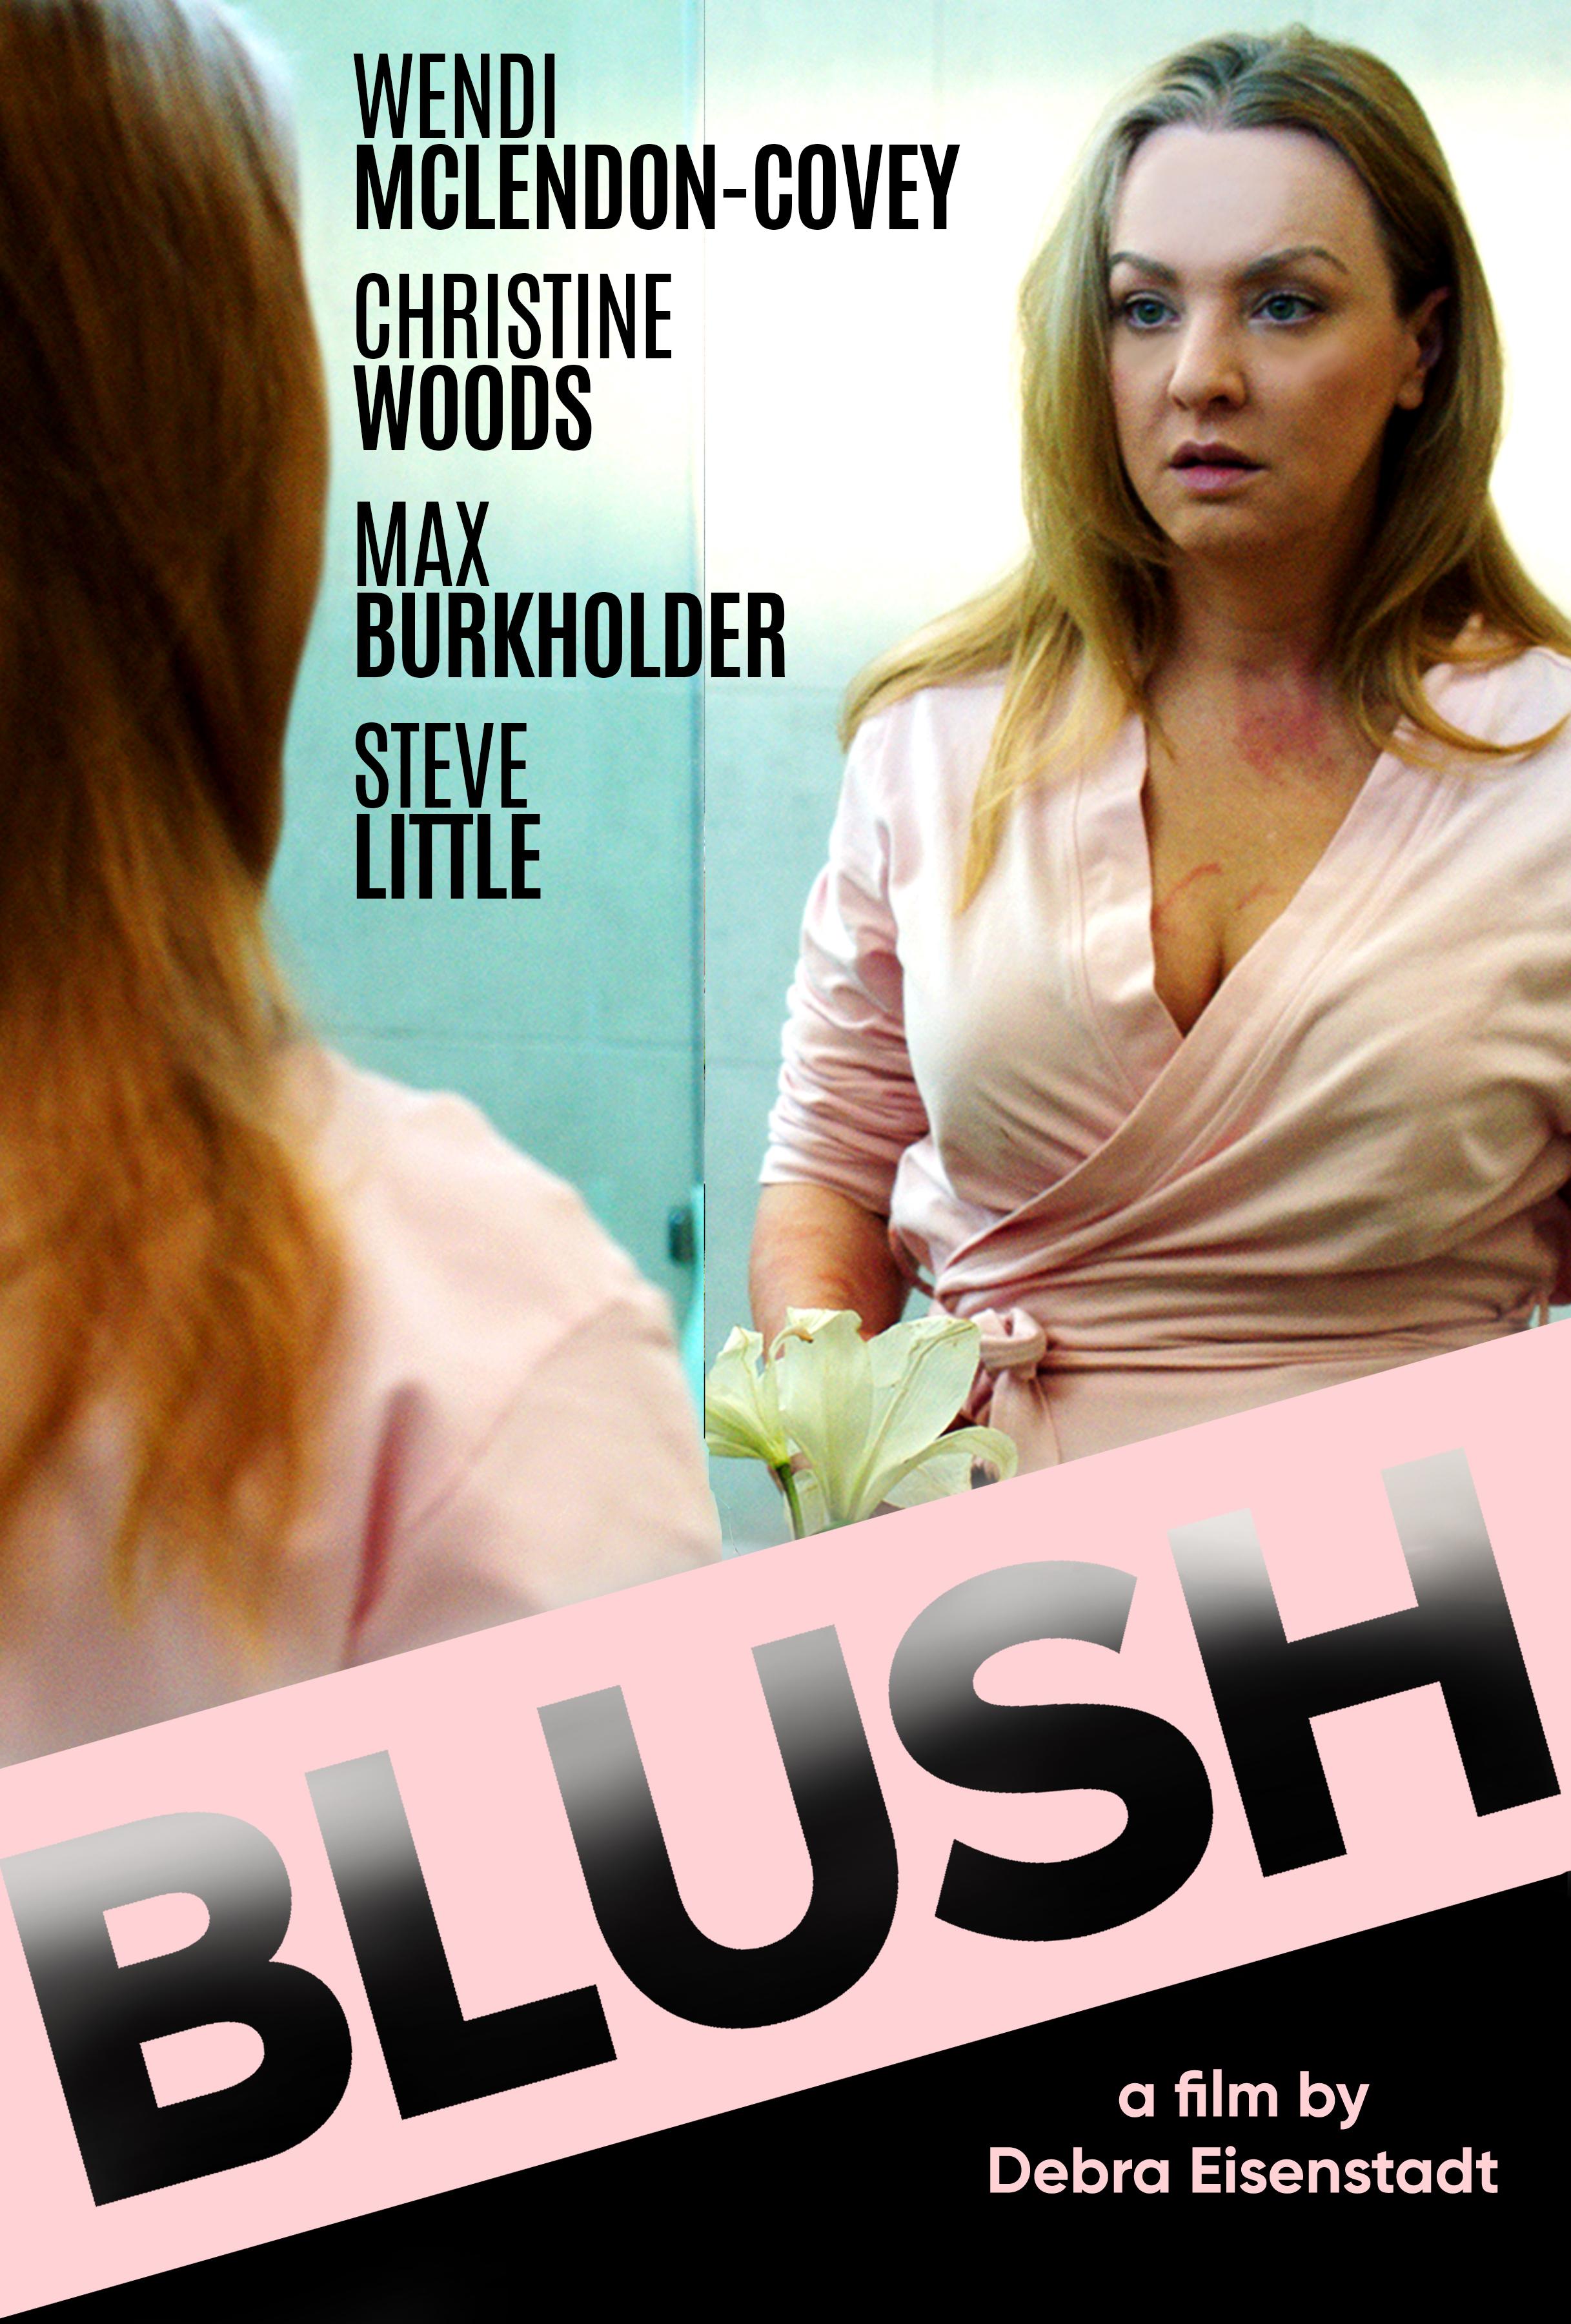 Download Blush (2019) WebRip 720p Full Movie [In English] With Hindi Subtitles Full Movie Online On 1xcinema.com